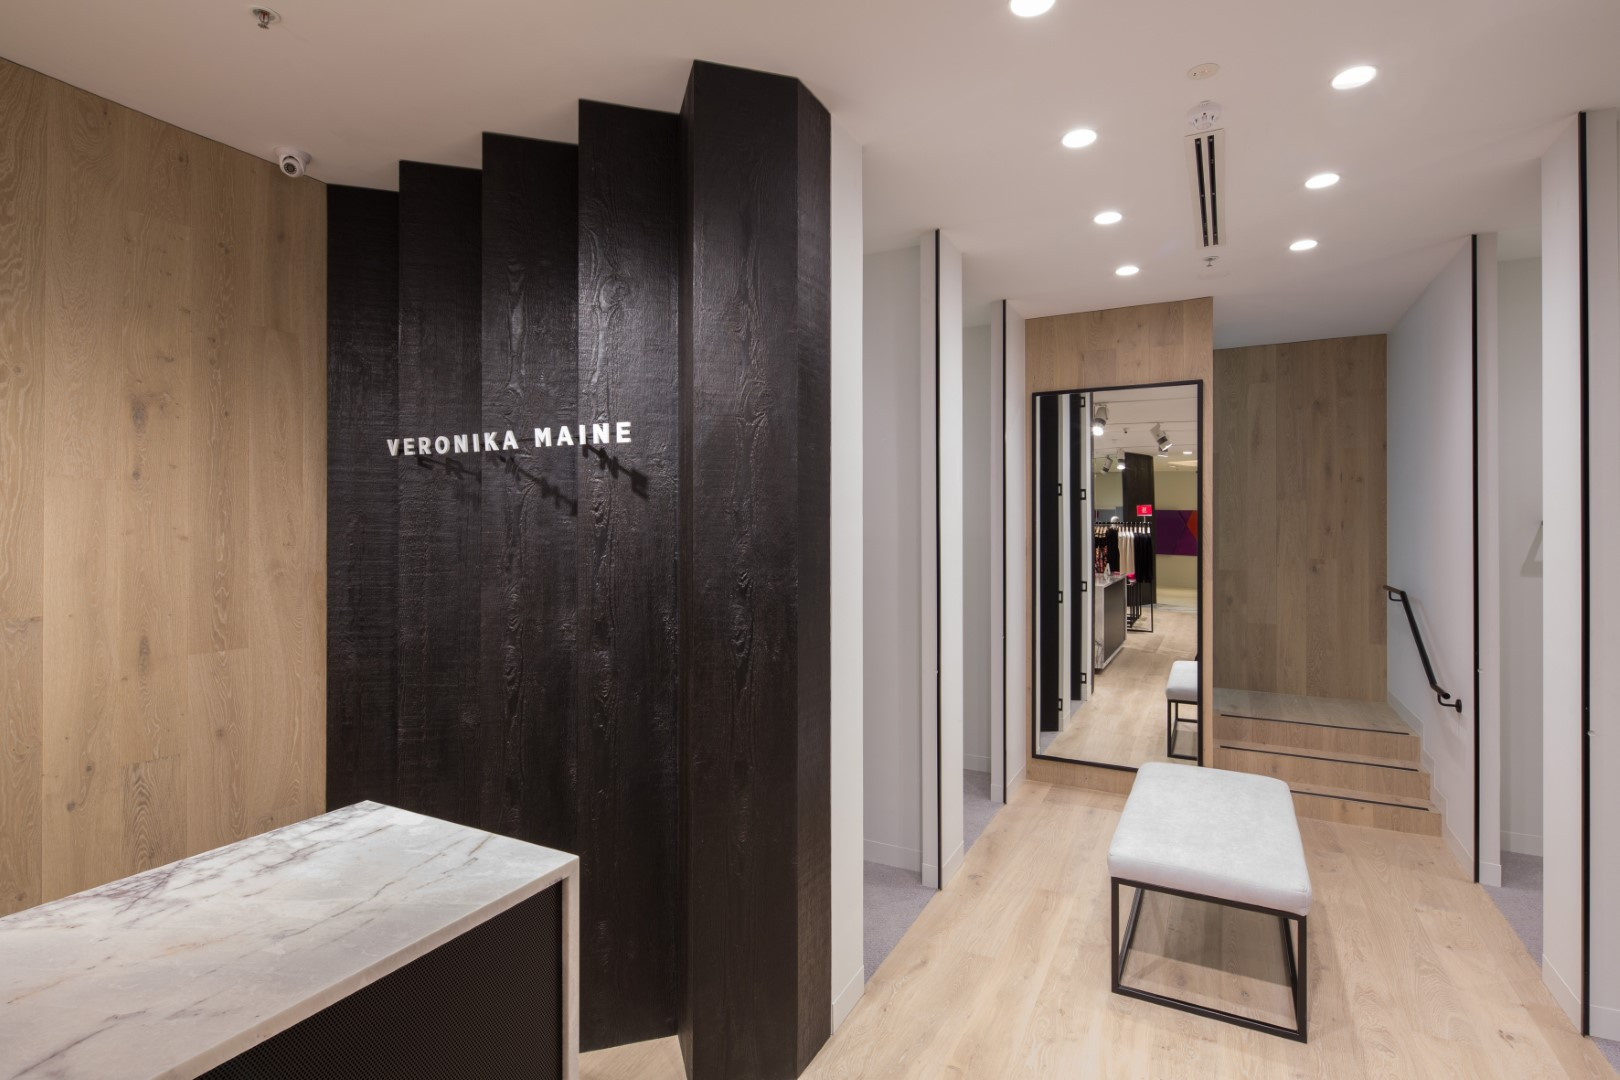 Veronika Maine Shop-16.jpg